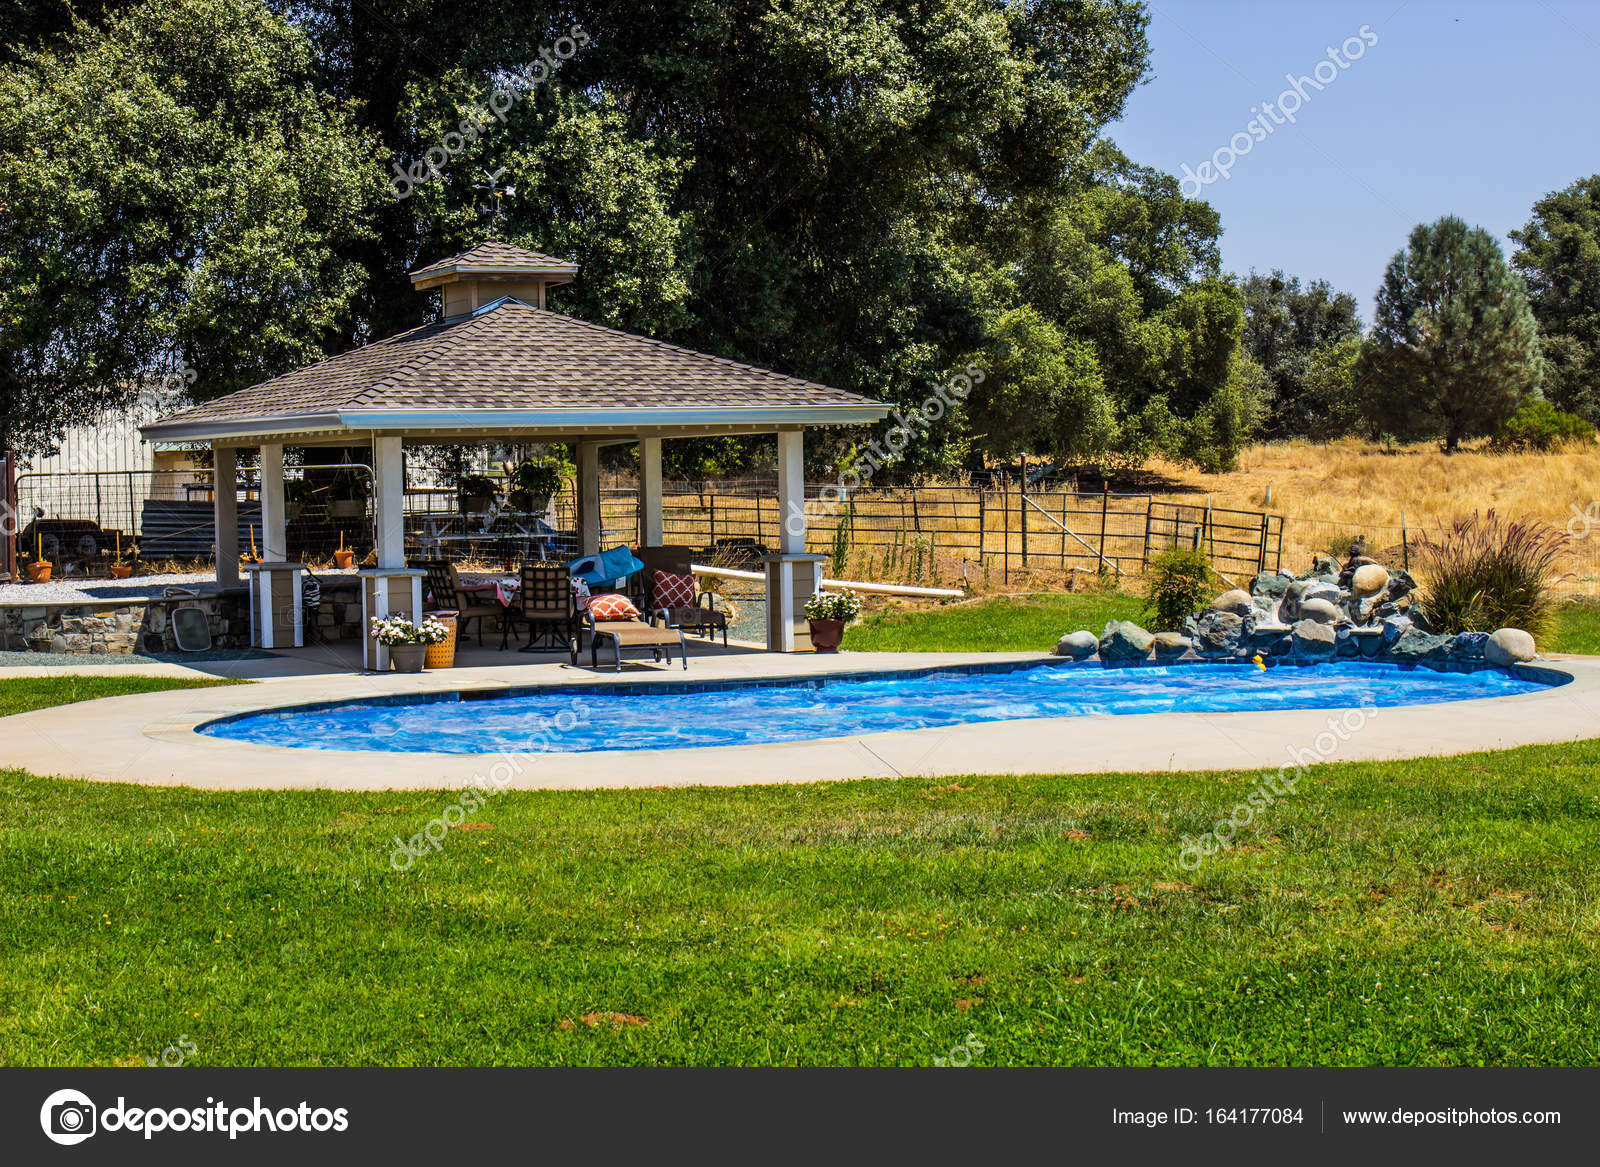 Pictures: pool gazebo | Gazebo & Swimming Pool On Ranch ...